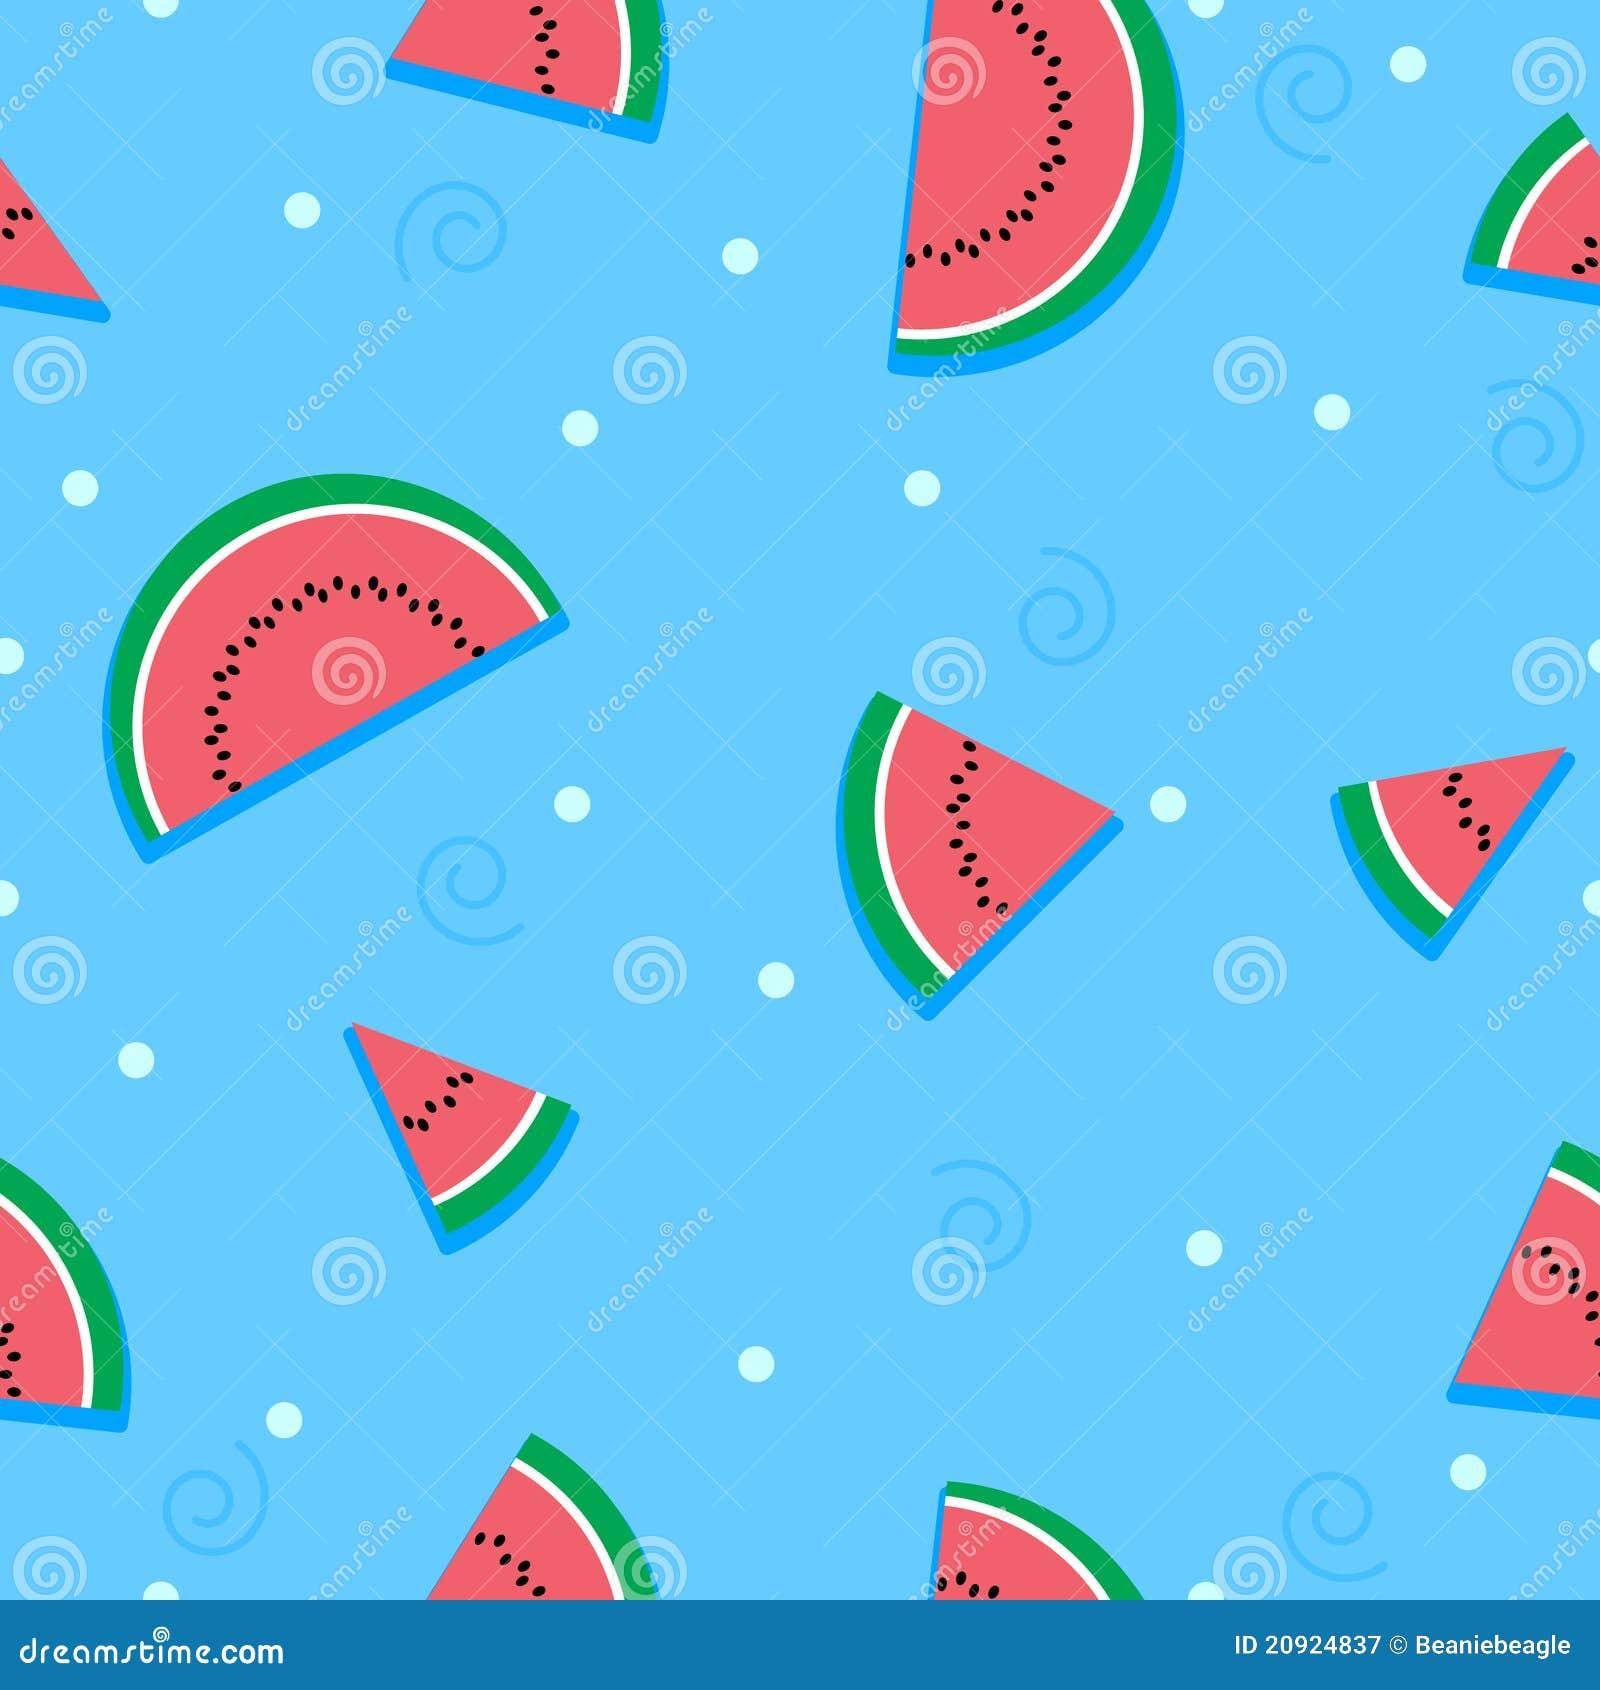 watermelon wallpaper hd